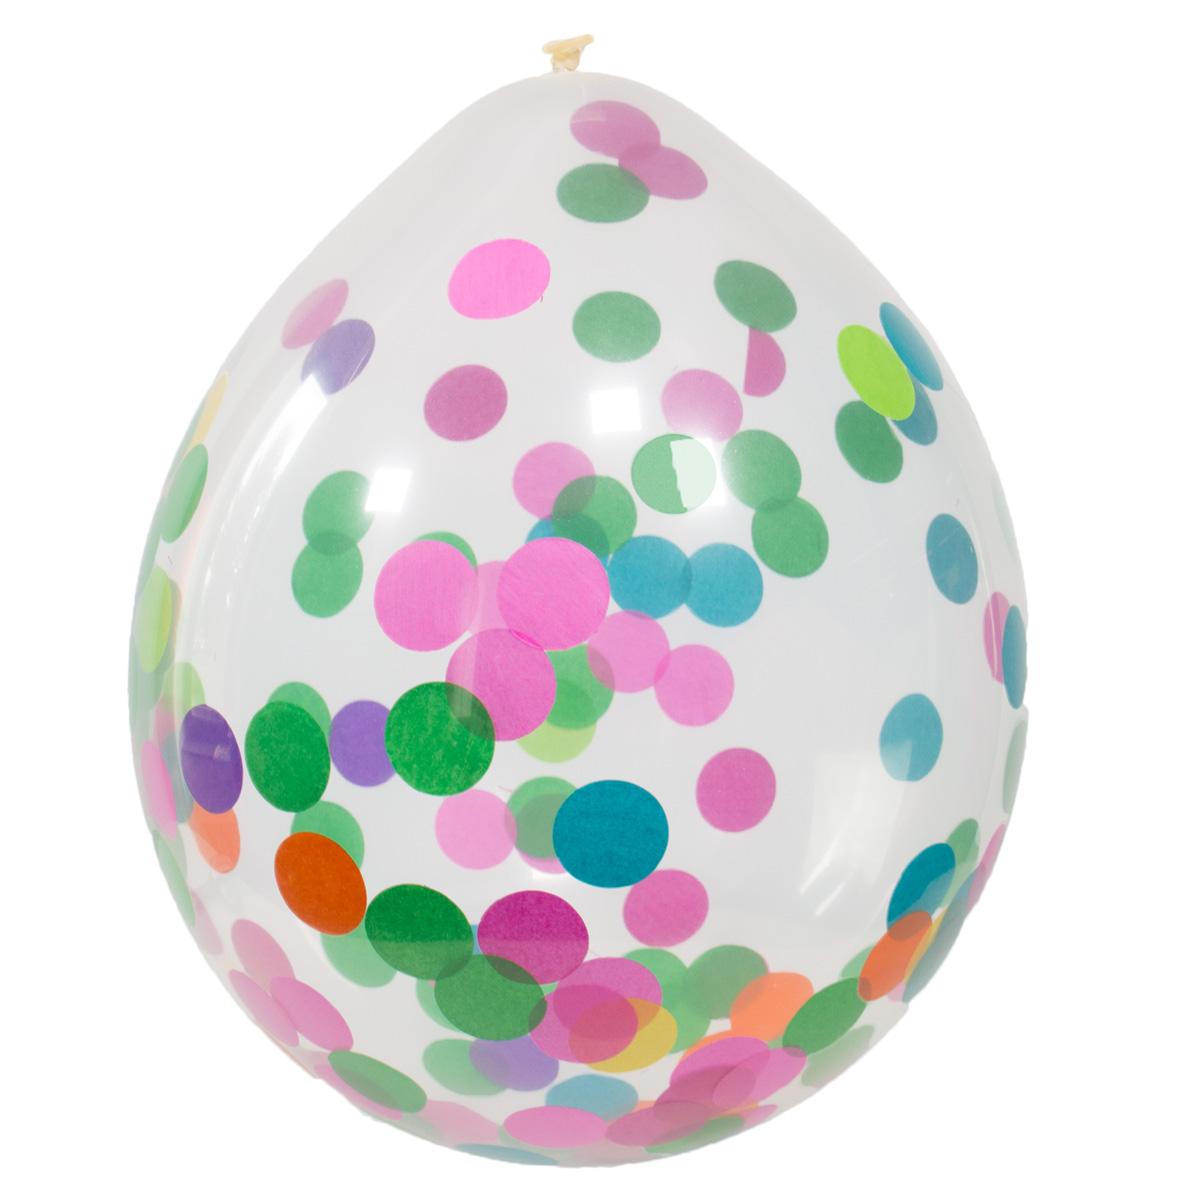 Konfetti Luftballons - Multicolor - 4er Set